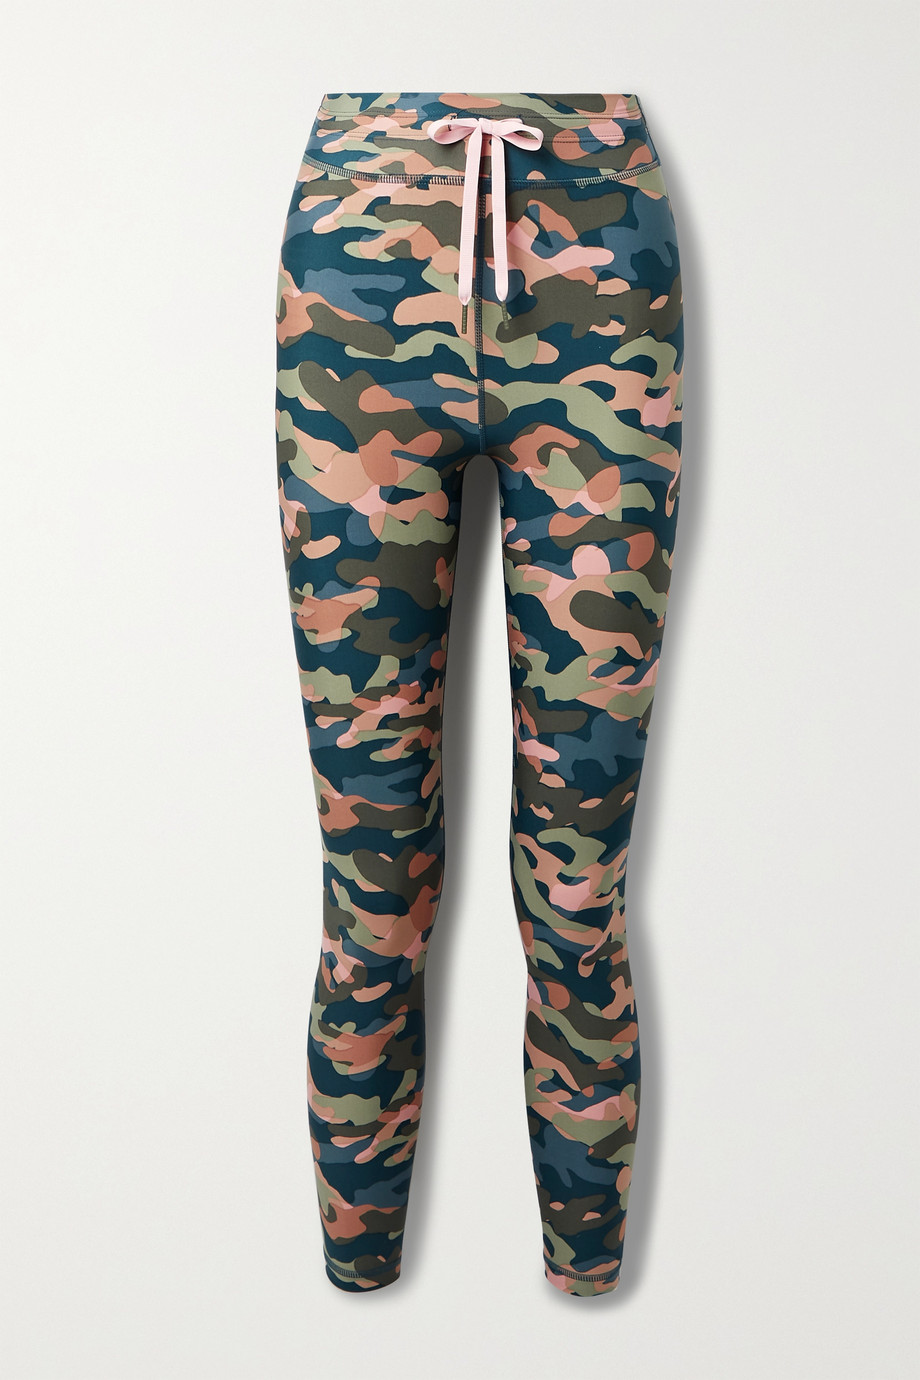 The Upside Himalaya camouflage-print stretch leggings